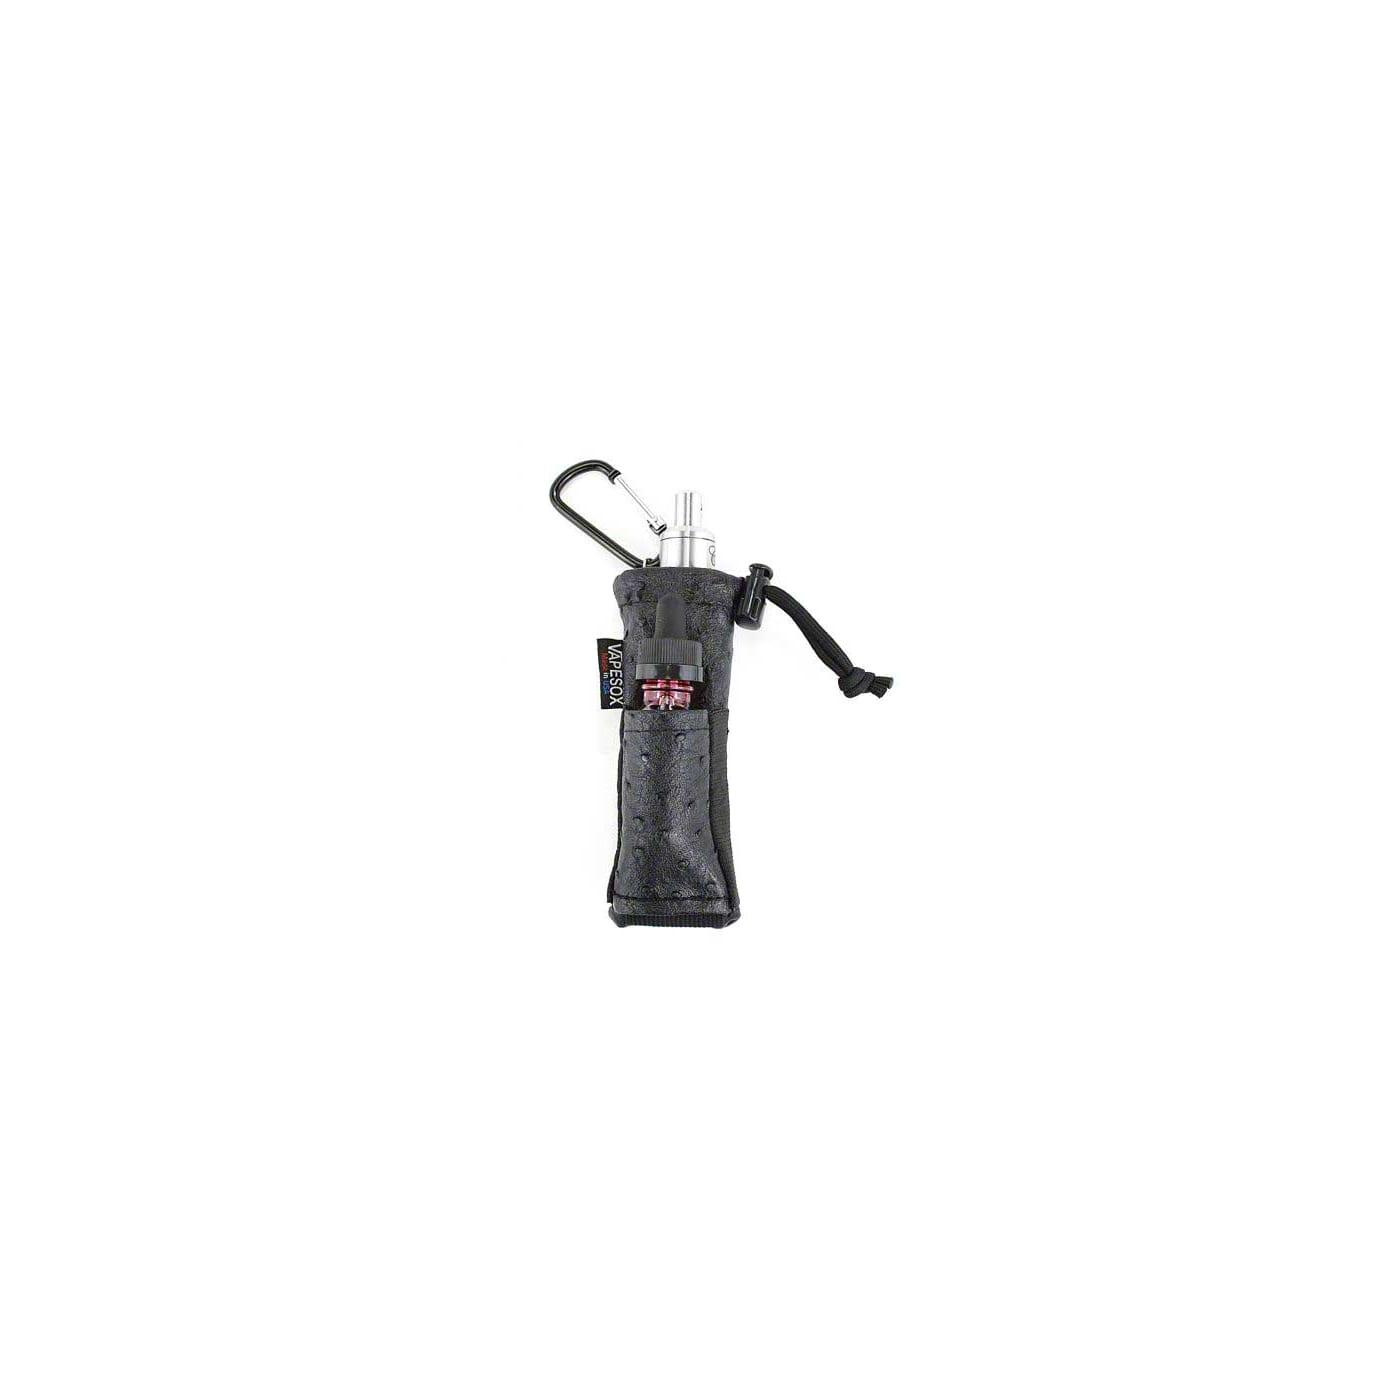 Vapesox VS5 Mod Holder - Black Ostrich Items